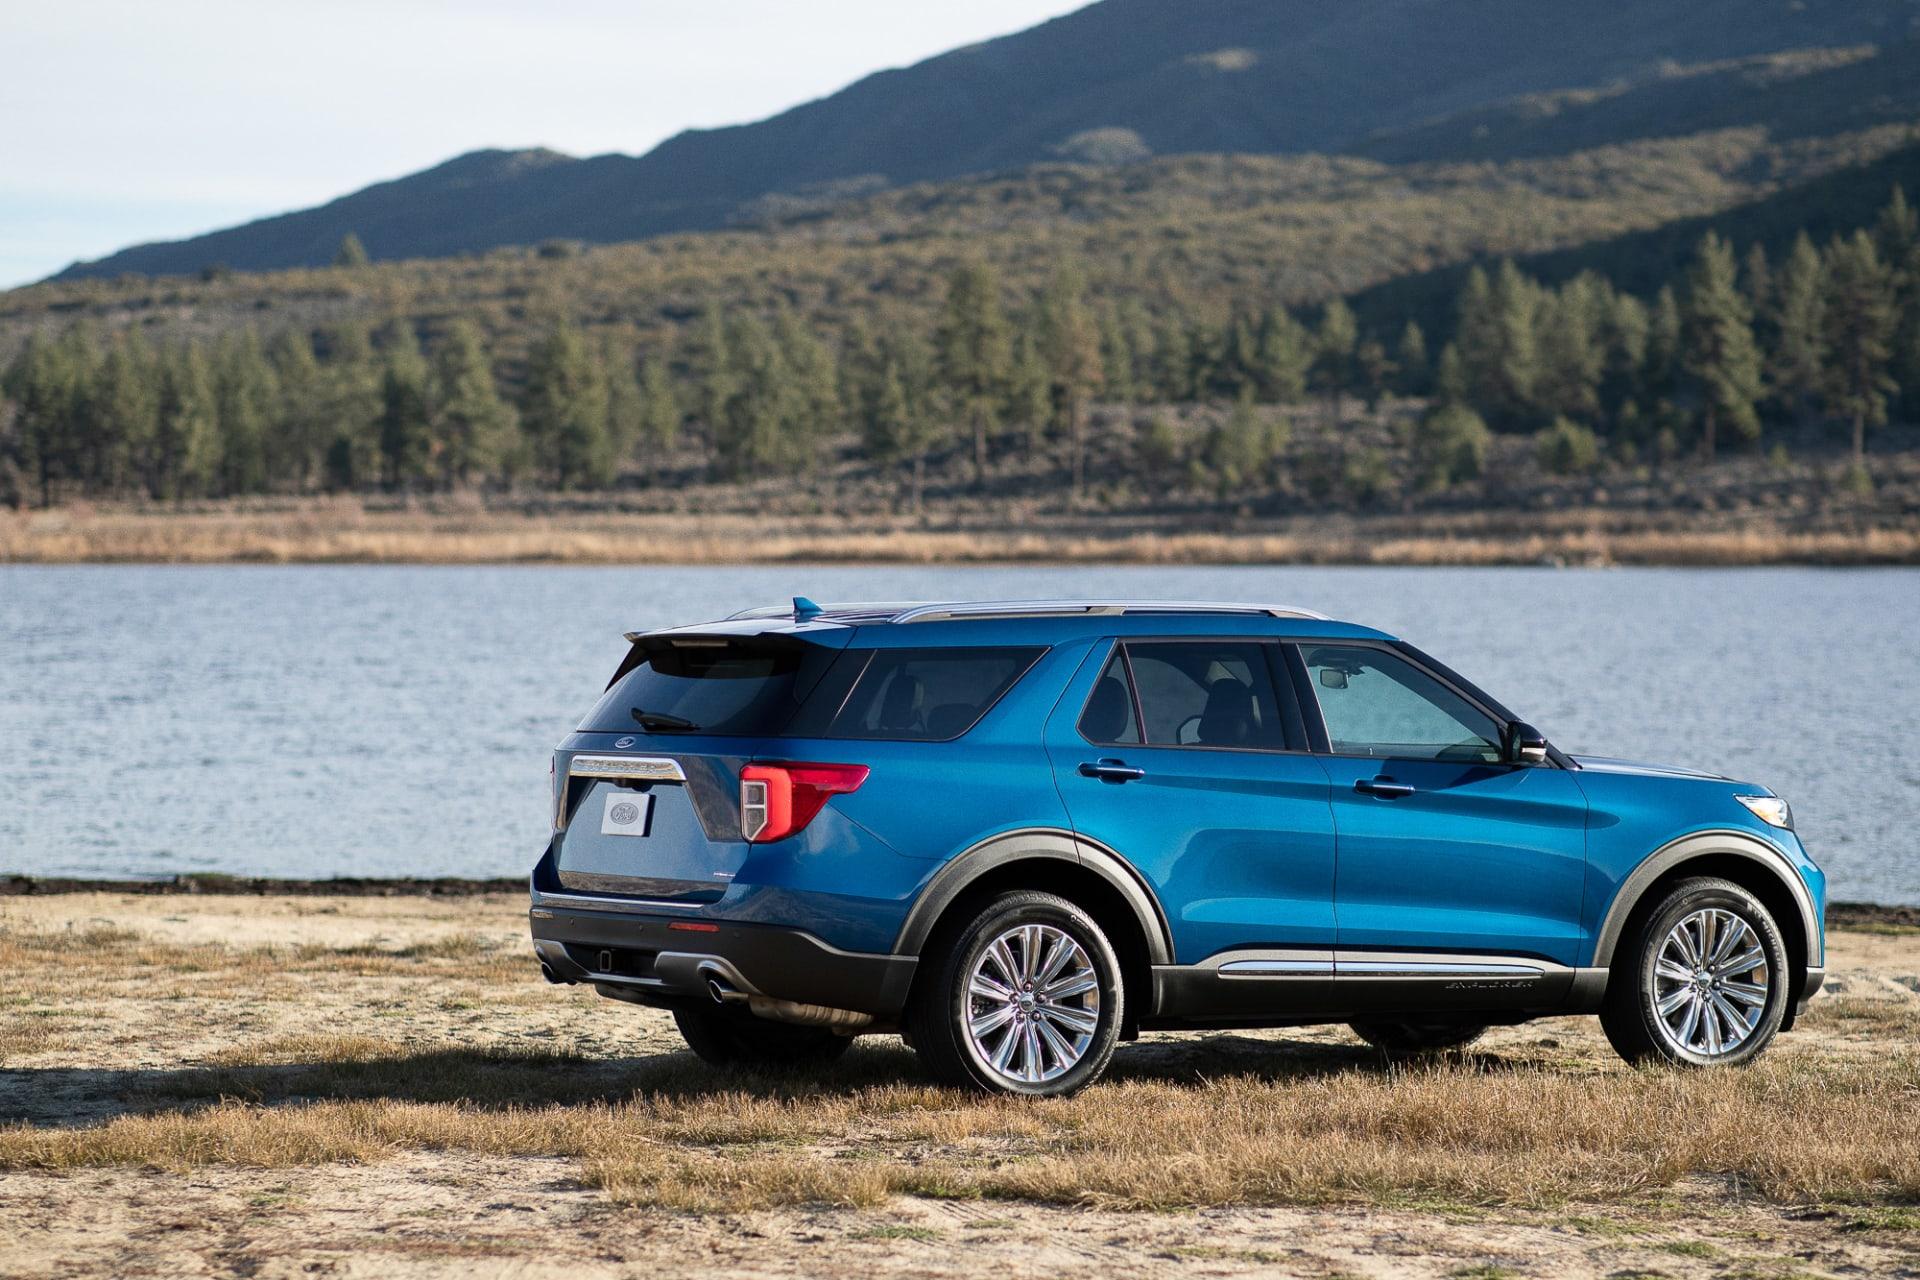 2020 Ford Edge Price, Hybrid, Third Row >> 2020 Ford Edge Price Hybrid Third Row Upcoming New Car Release 2020